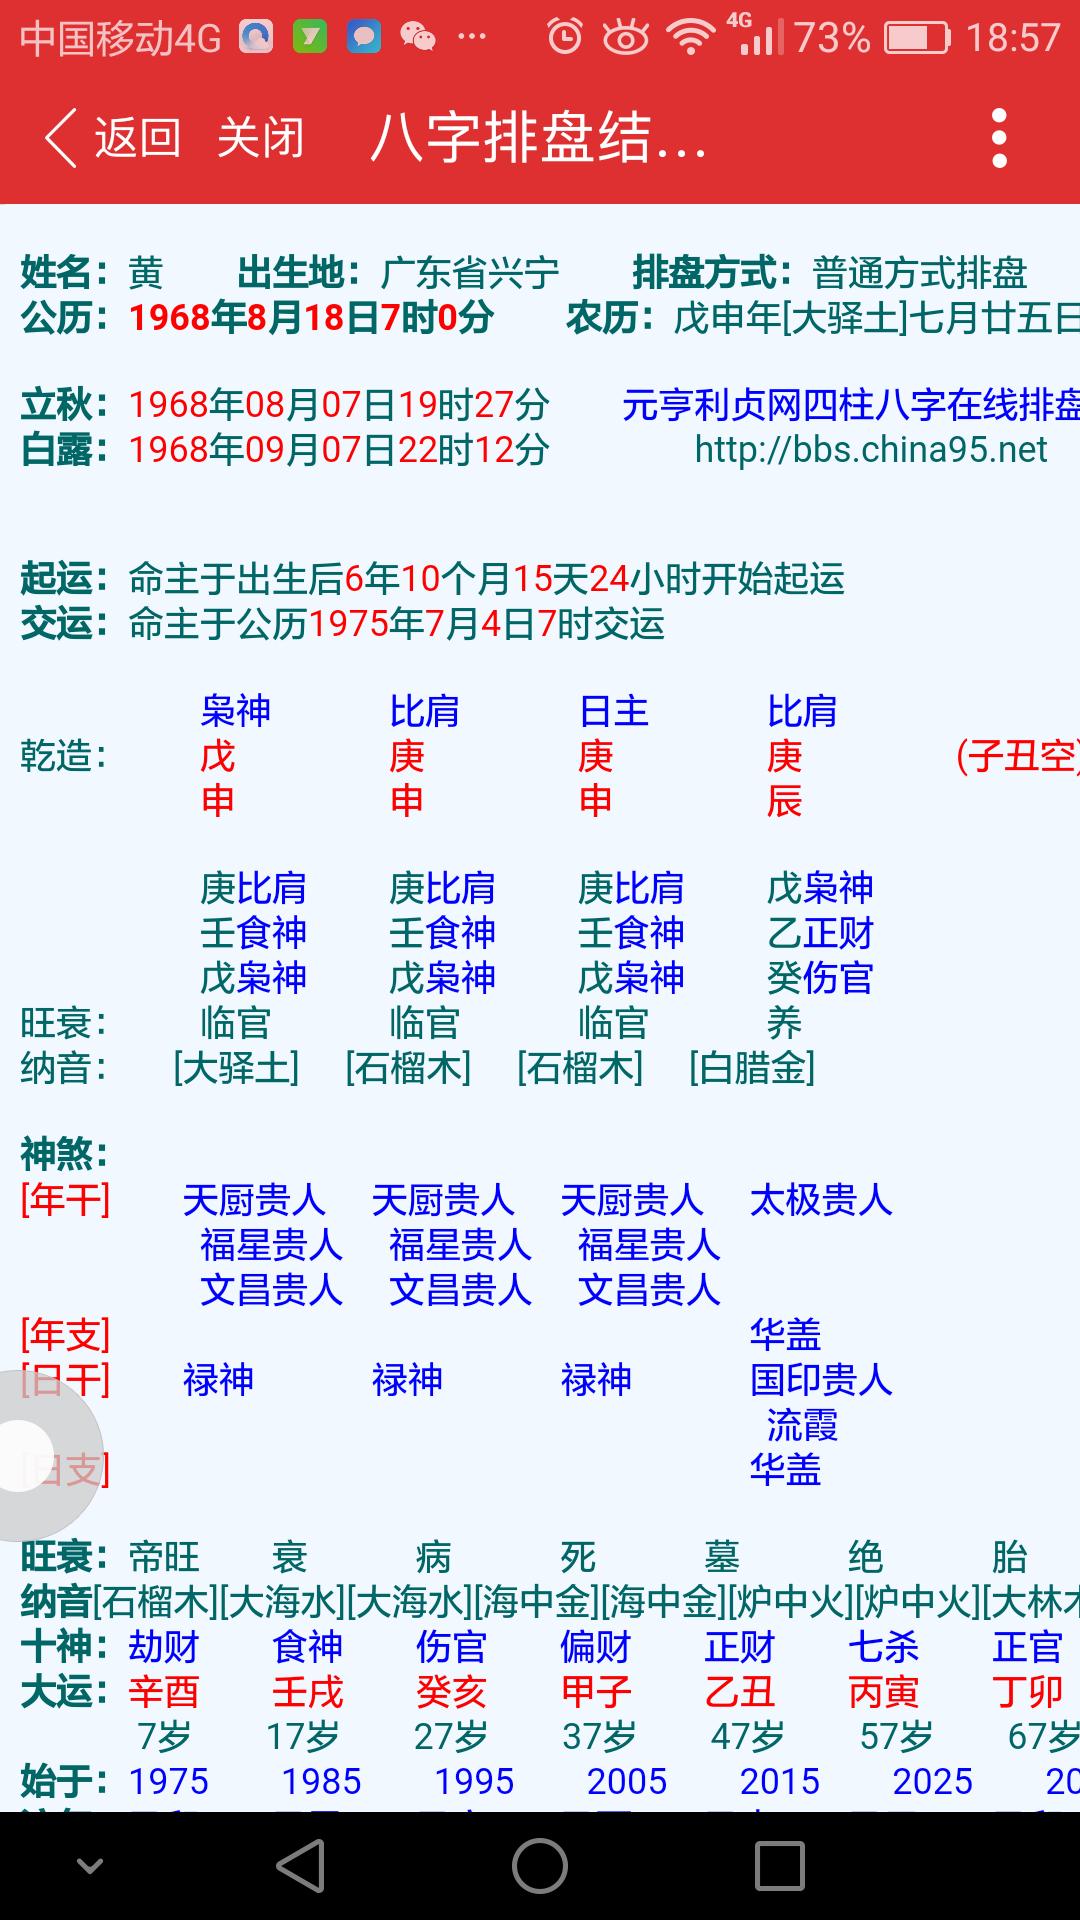 Screenshot_2018-12-27-18-57-41.png